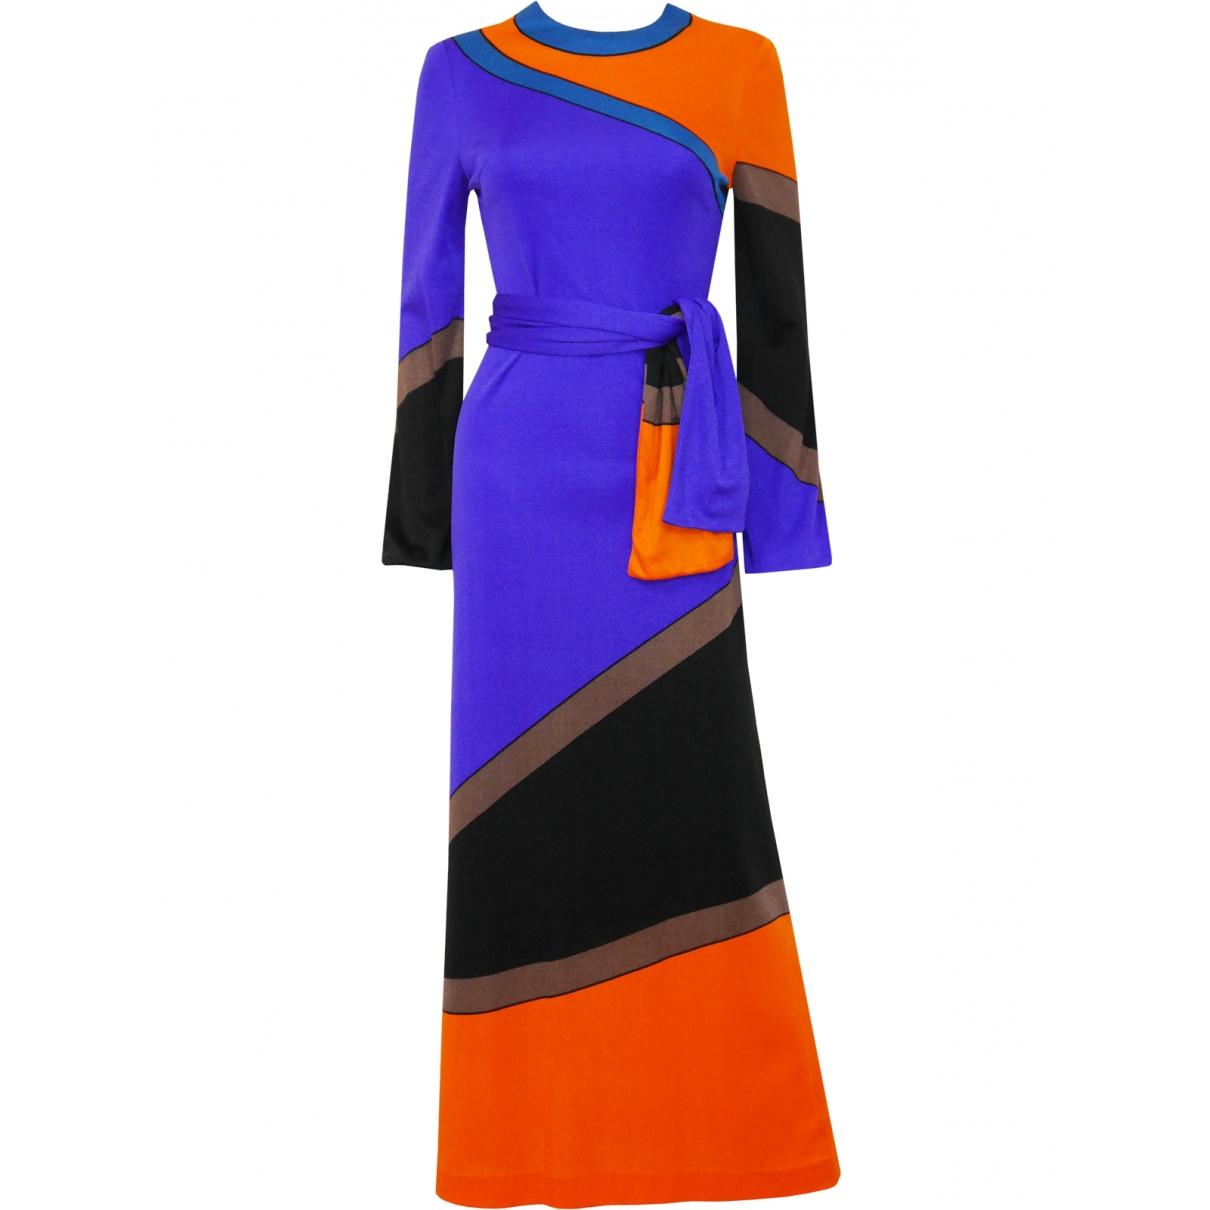 Louis Feraud \N Multicolour dress for Women S International